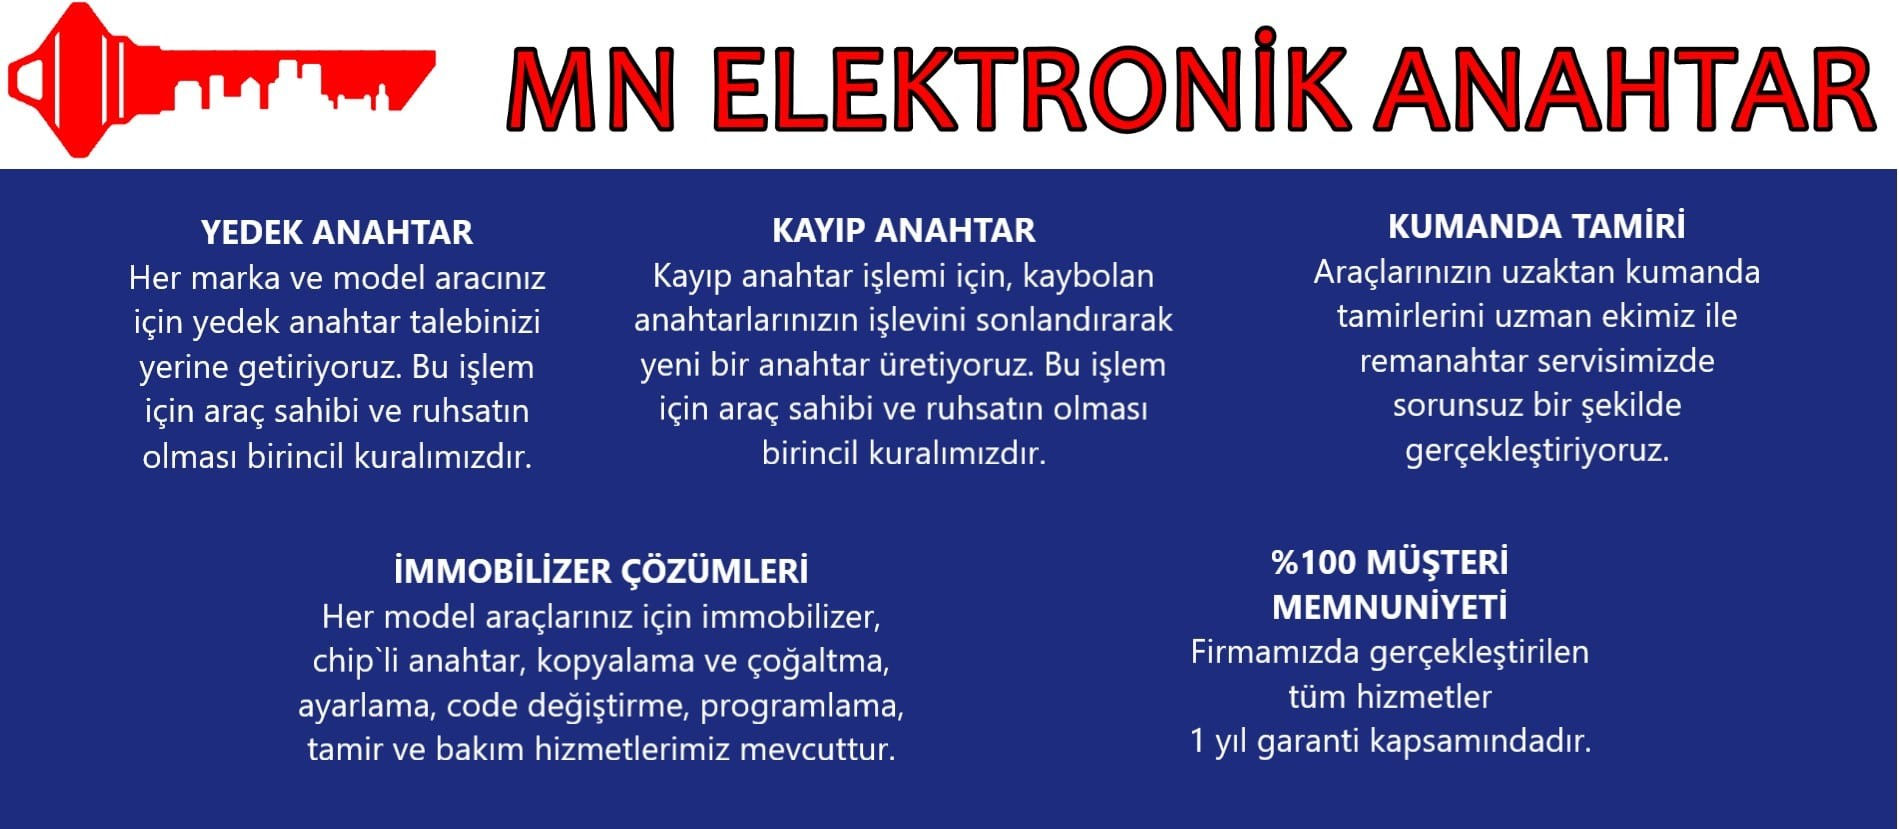 Mn Elektronik Anahtar